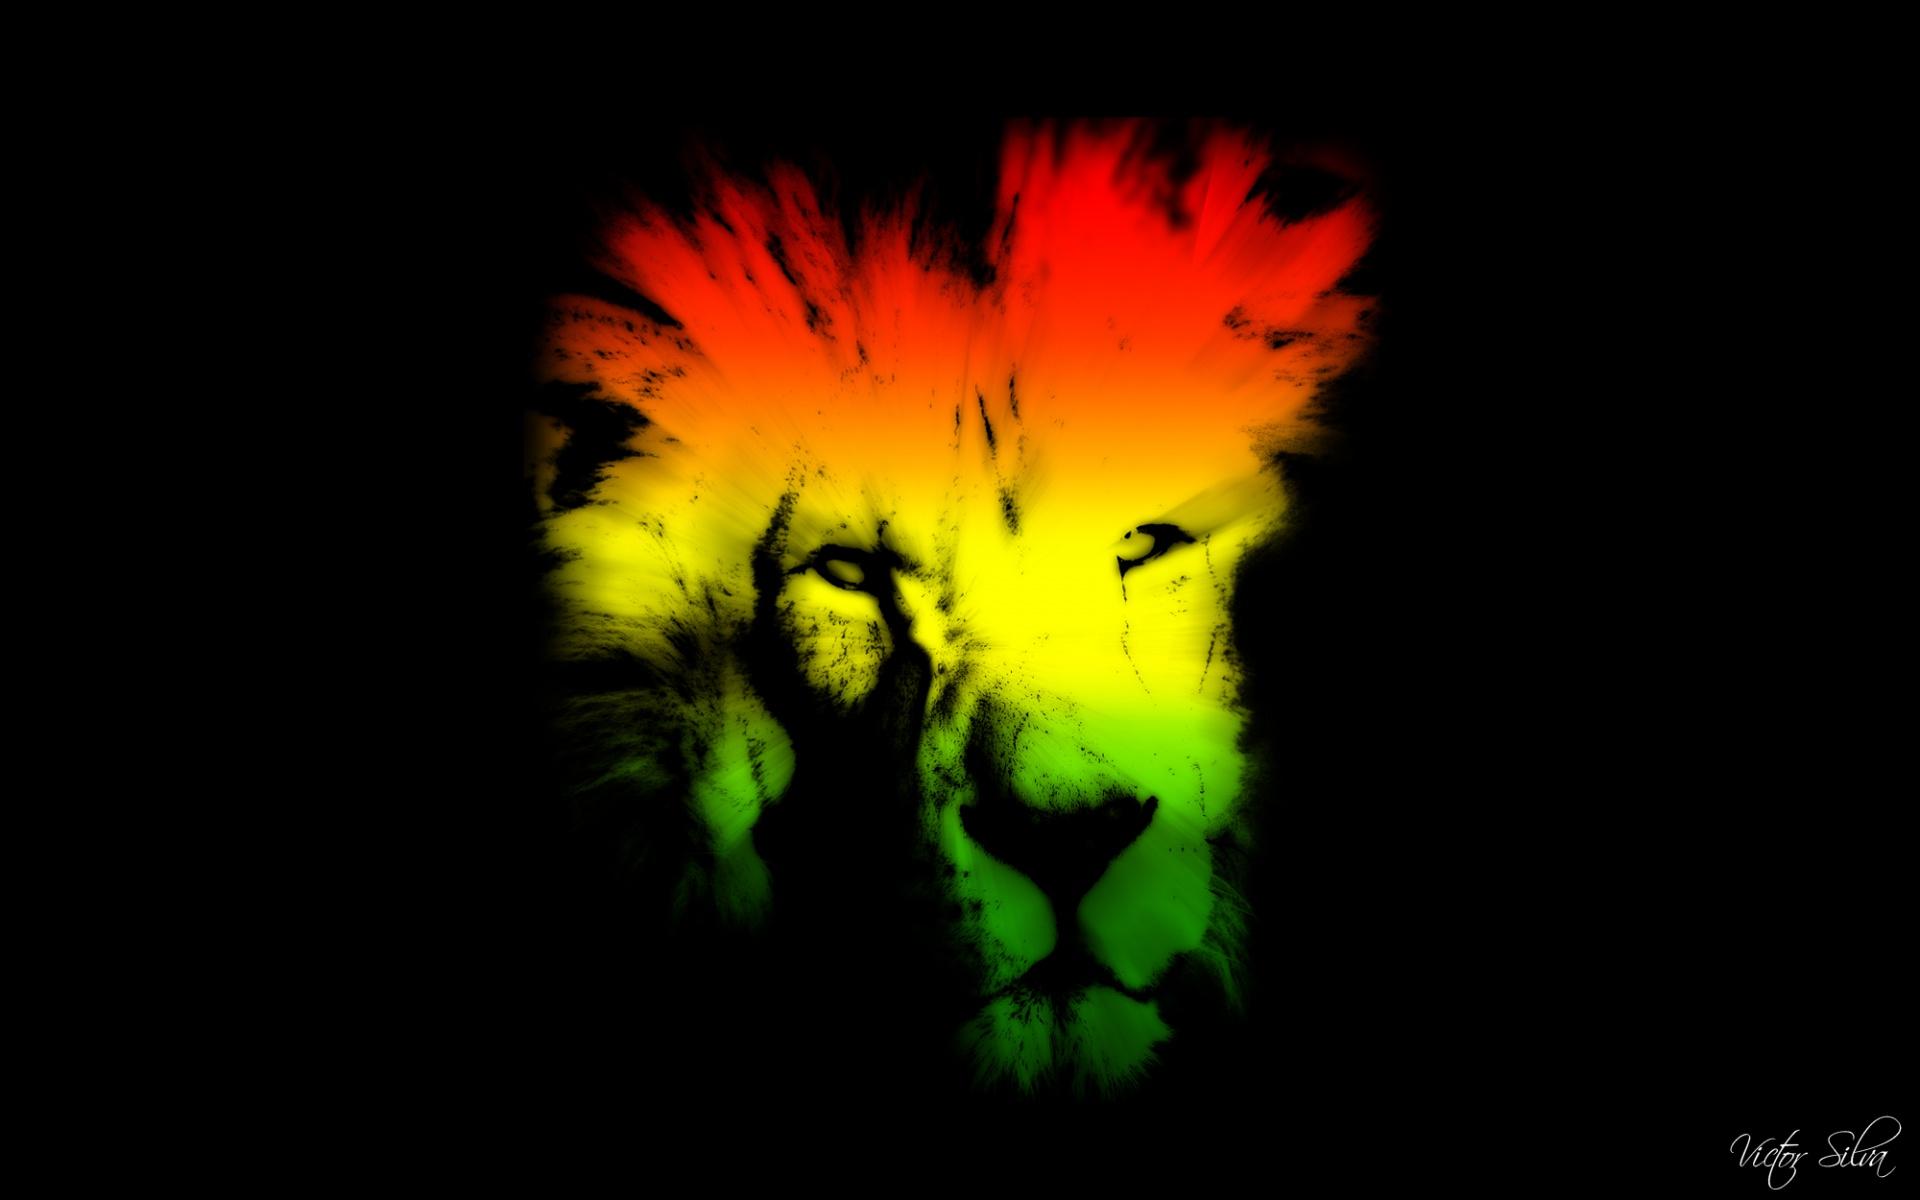 rasta_lion-1920x1200.jpg Rasta 1920x1200